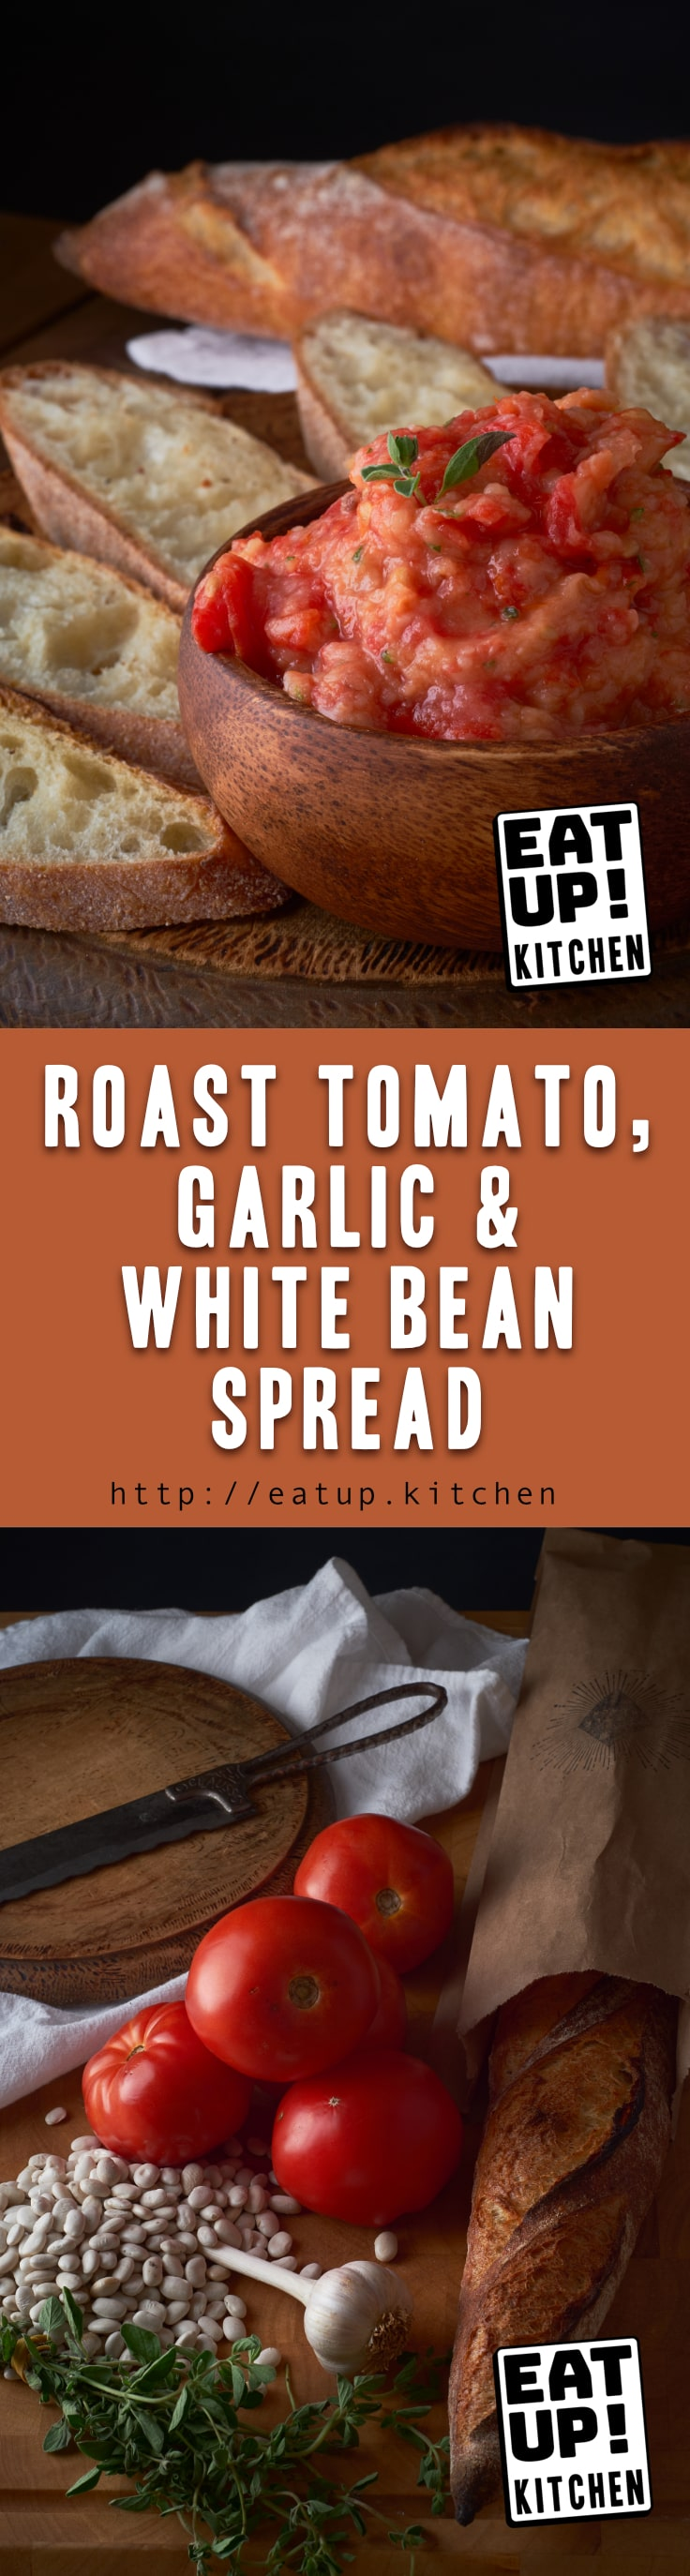 Roast Tomato, Garlic, and White Bean Spread